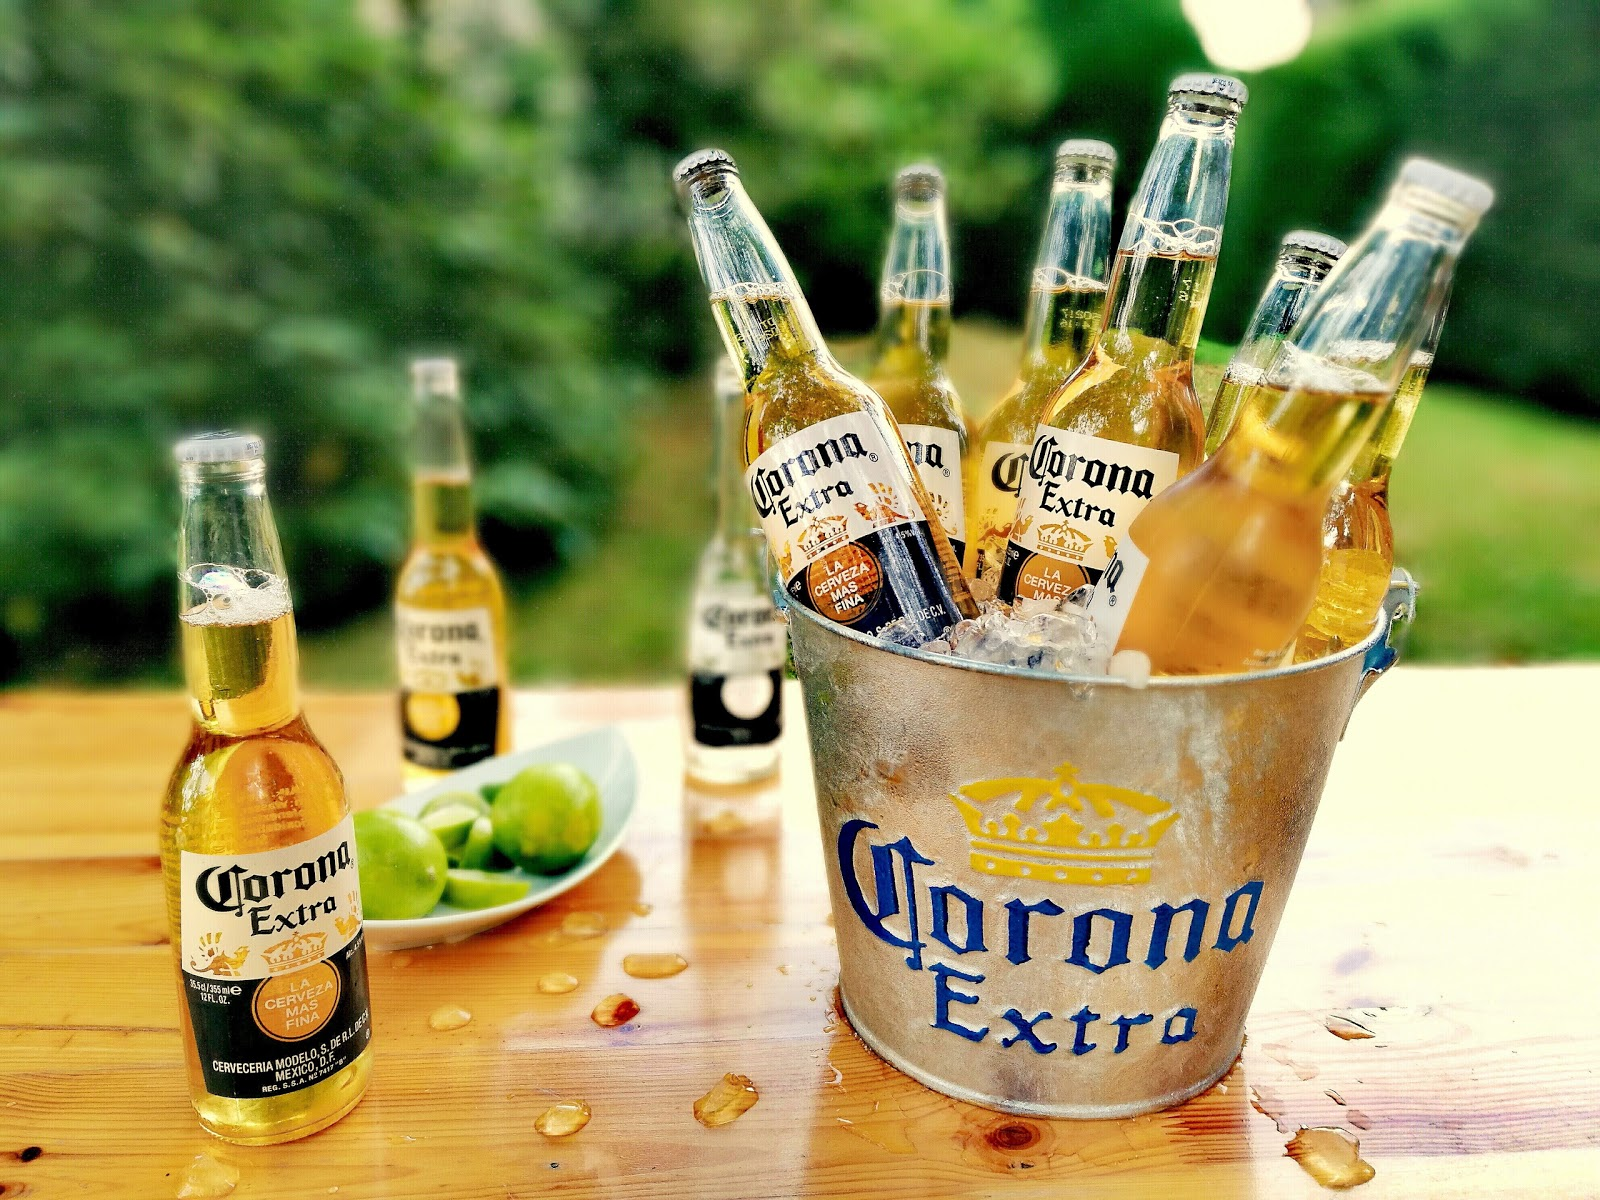 Sommer Corona